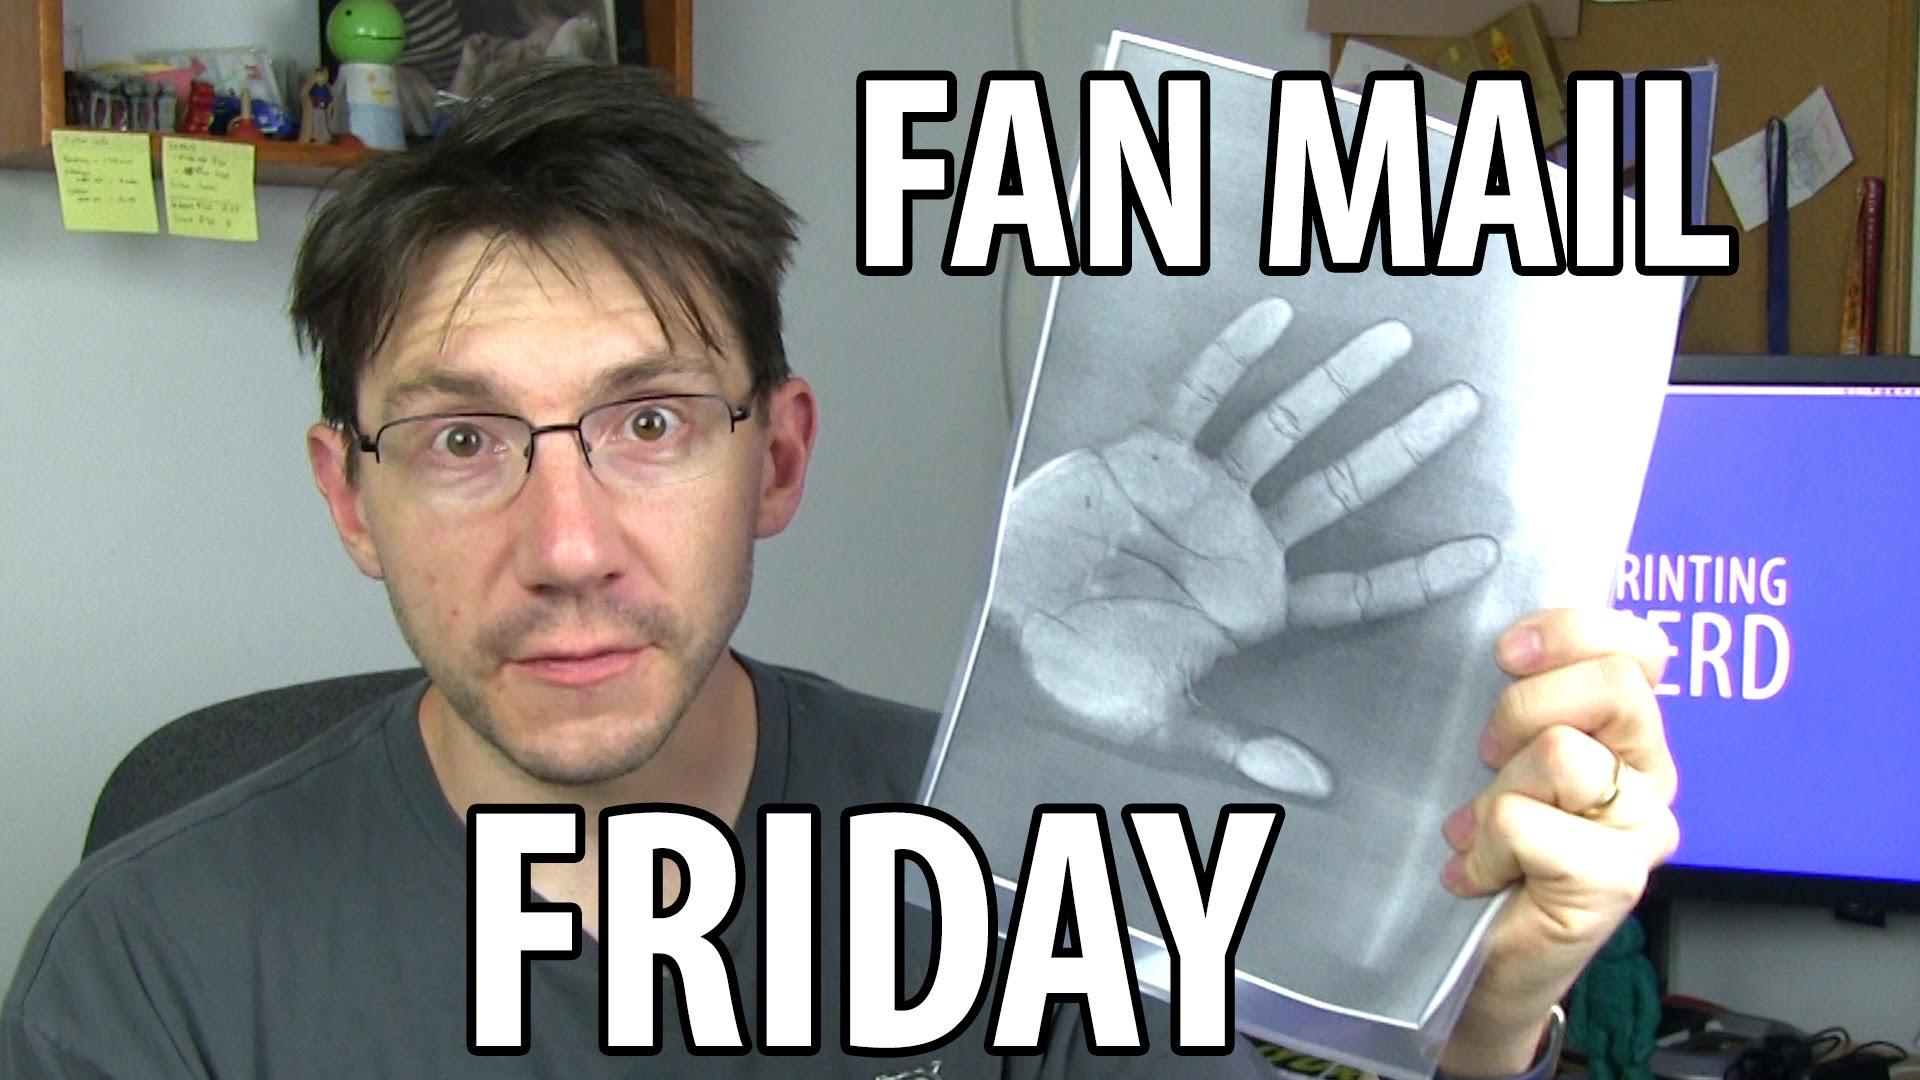 Fan Mail Friday 010 – Polysmooth Polysher Edition